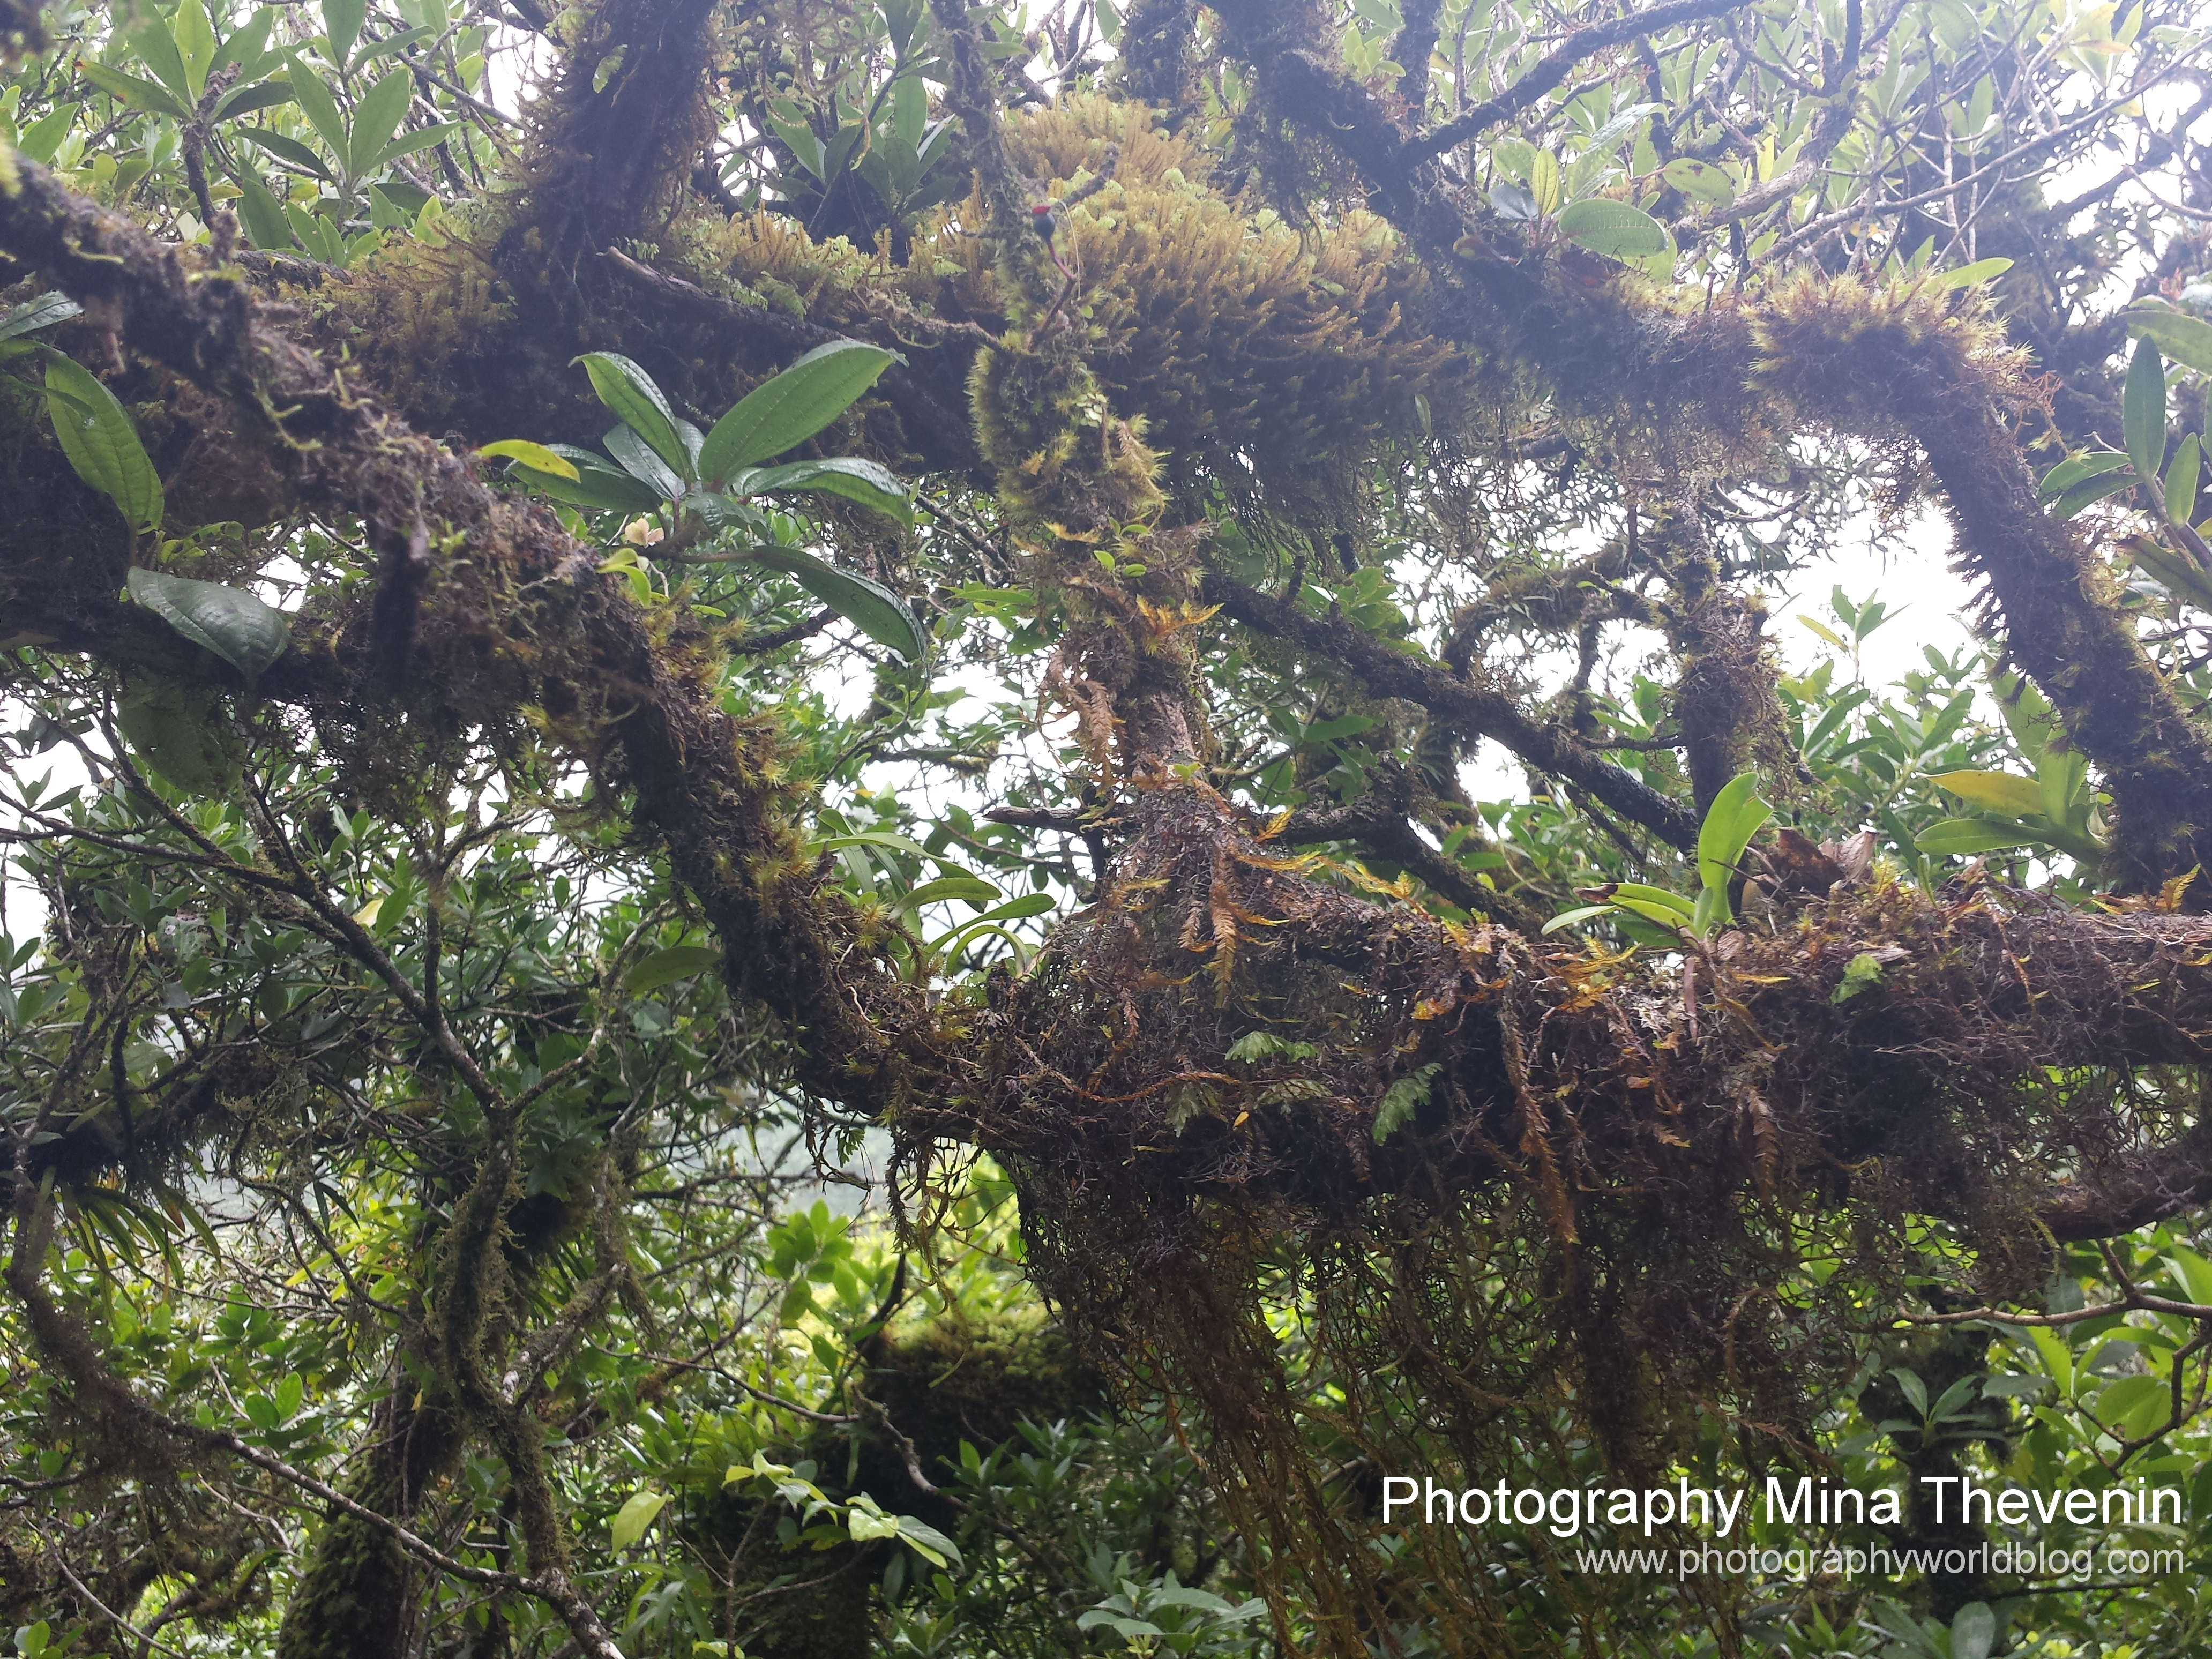 © Rainforest Mt Liamuiga. Photographer Mina Thevenin. Photography World. www.photographyworld.org